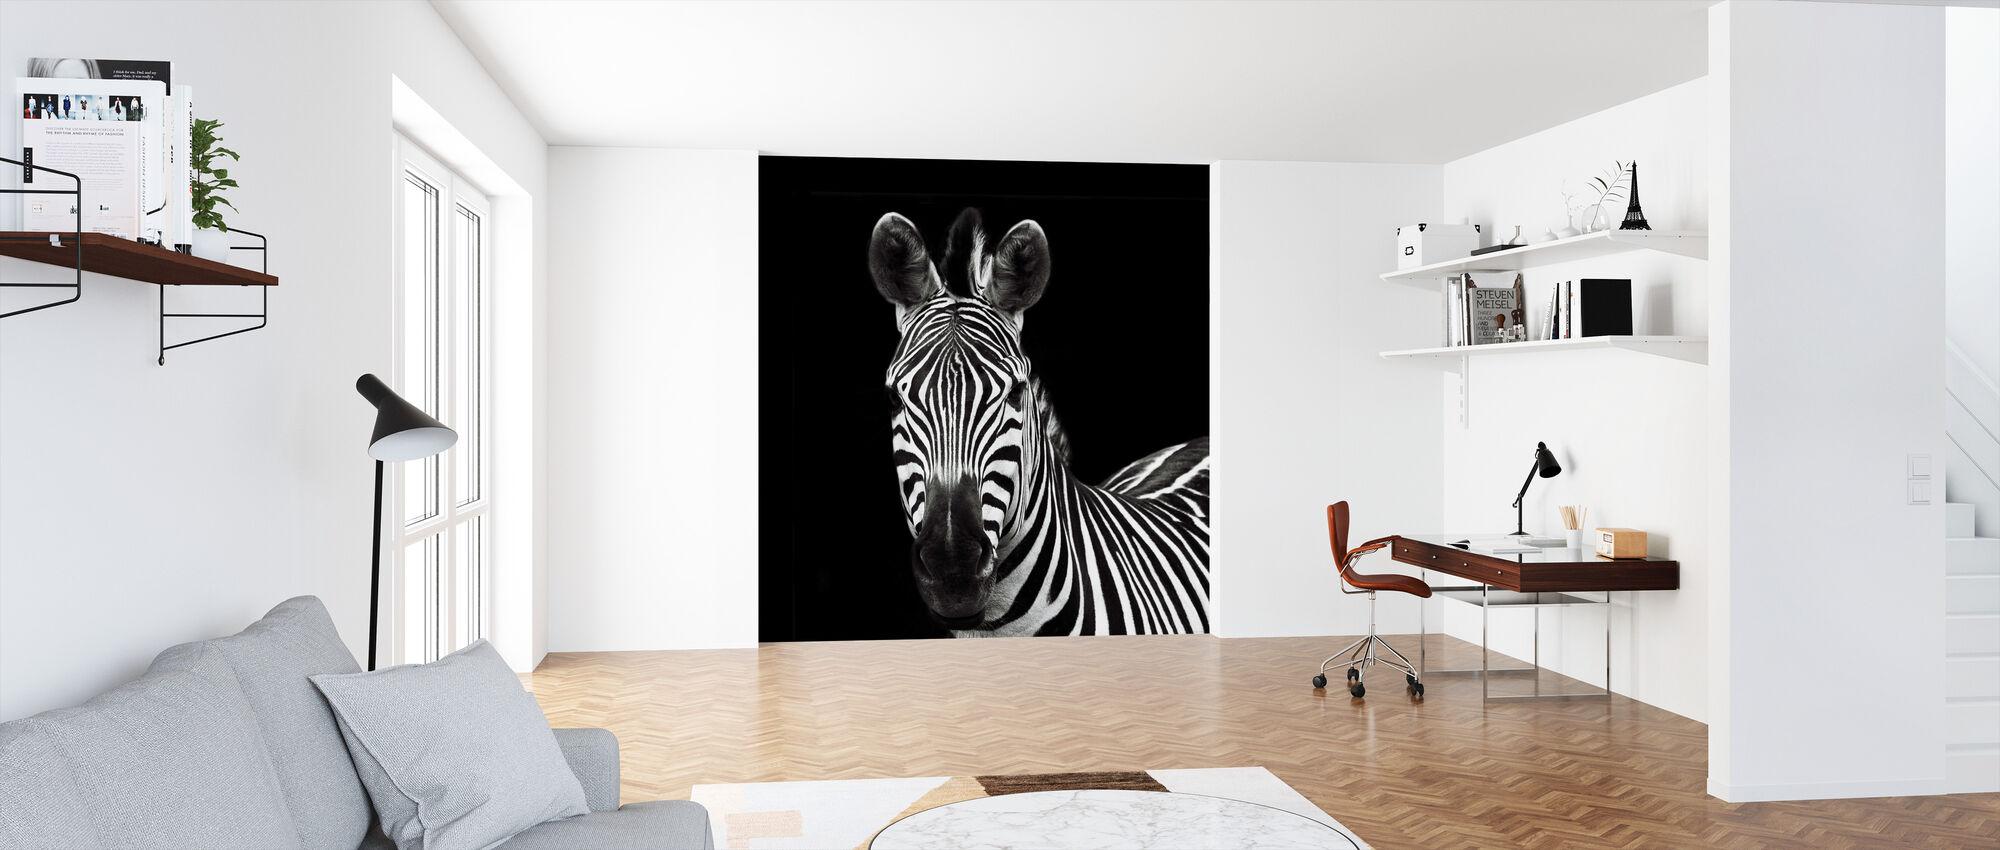 Zebra II Square - Wallpaper - Office